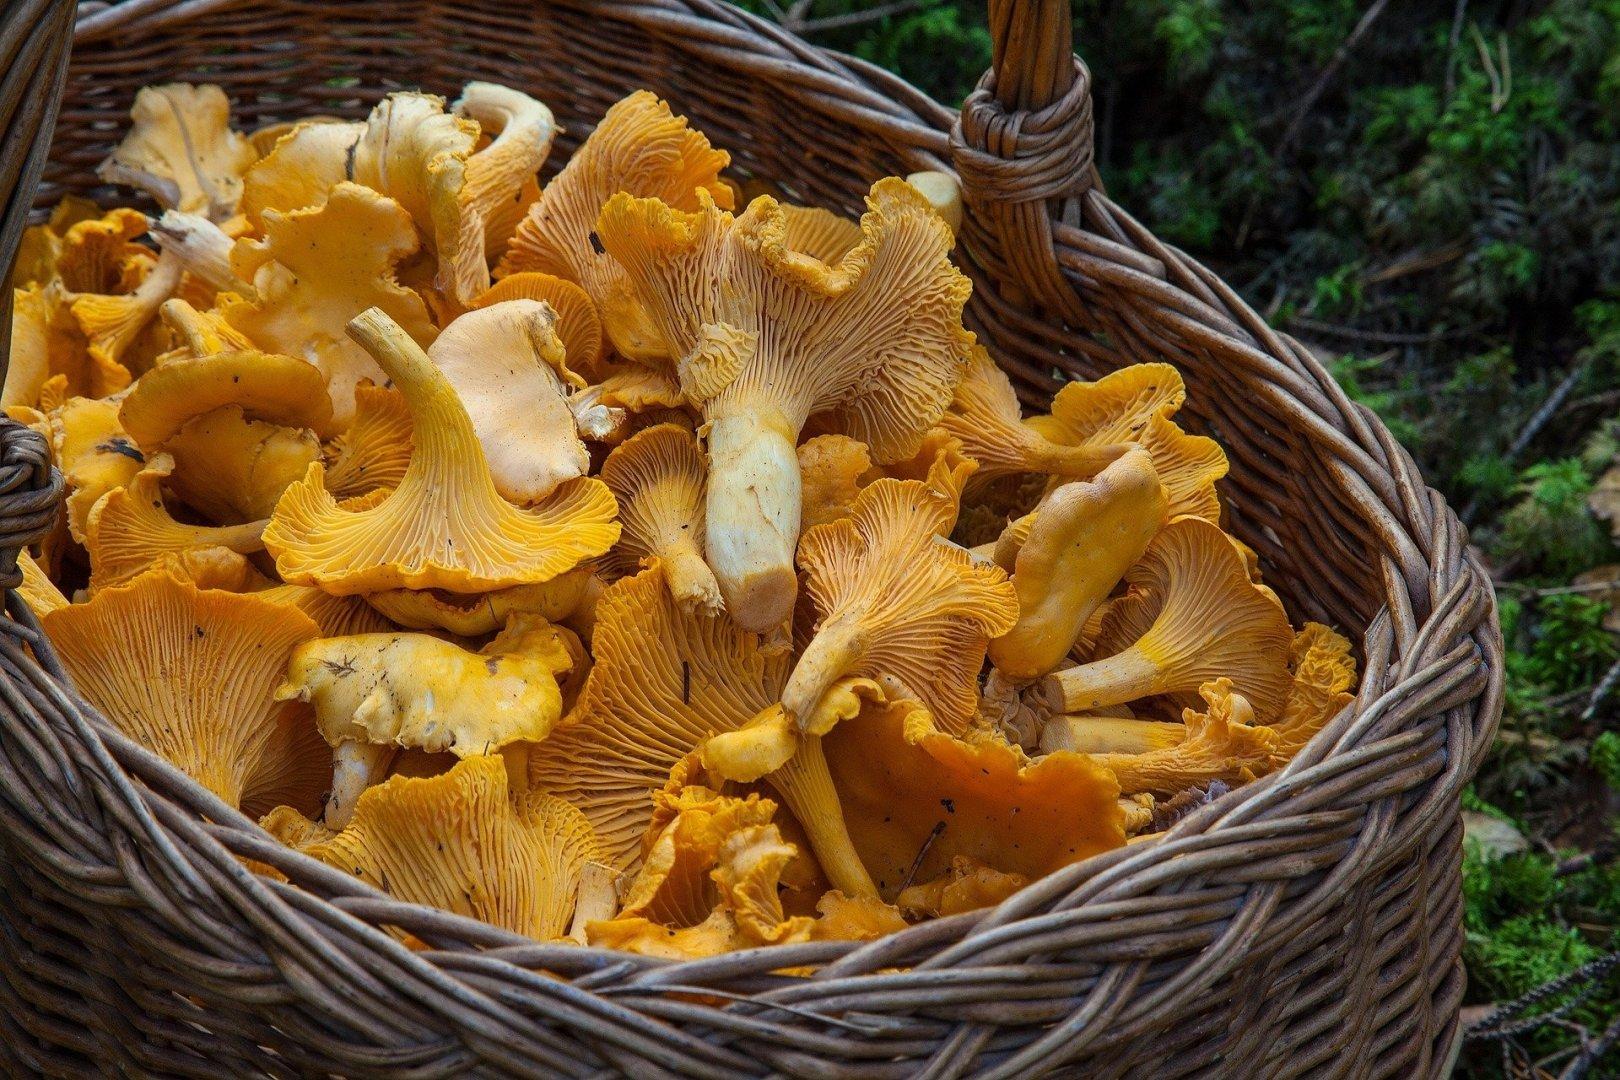 Mushroom picking in Poland